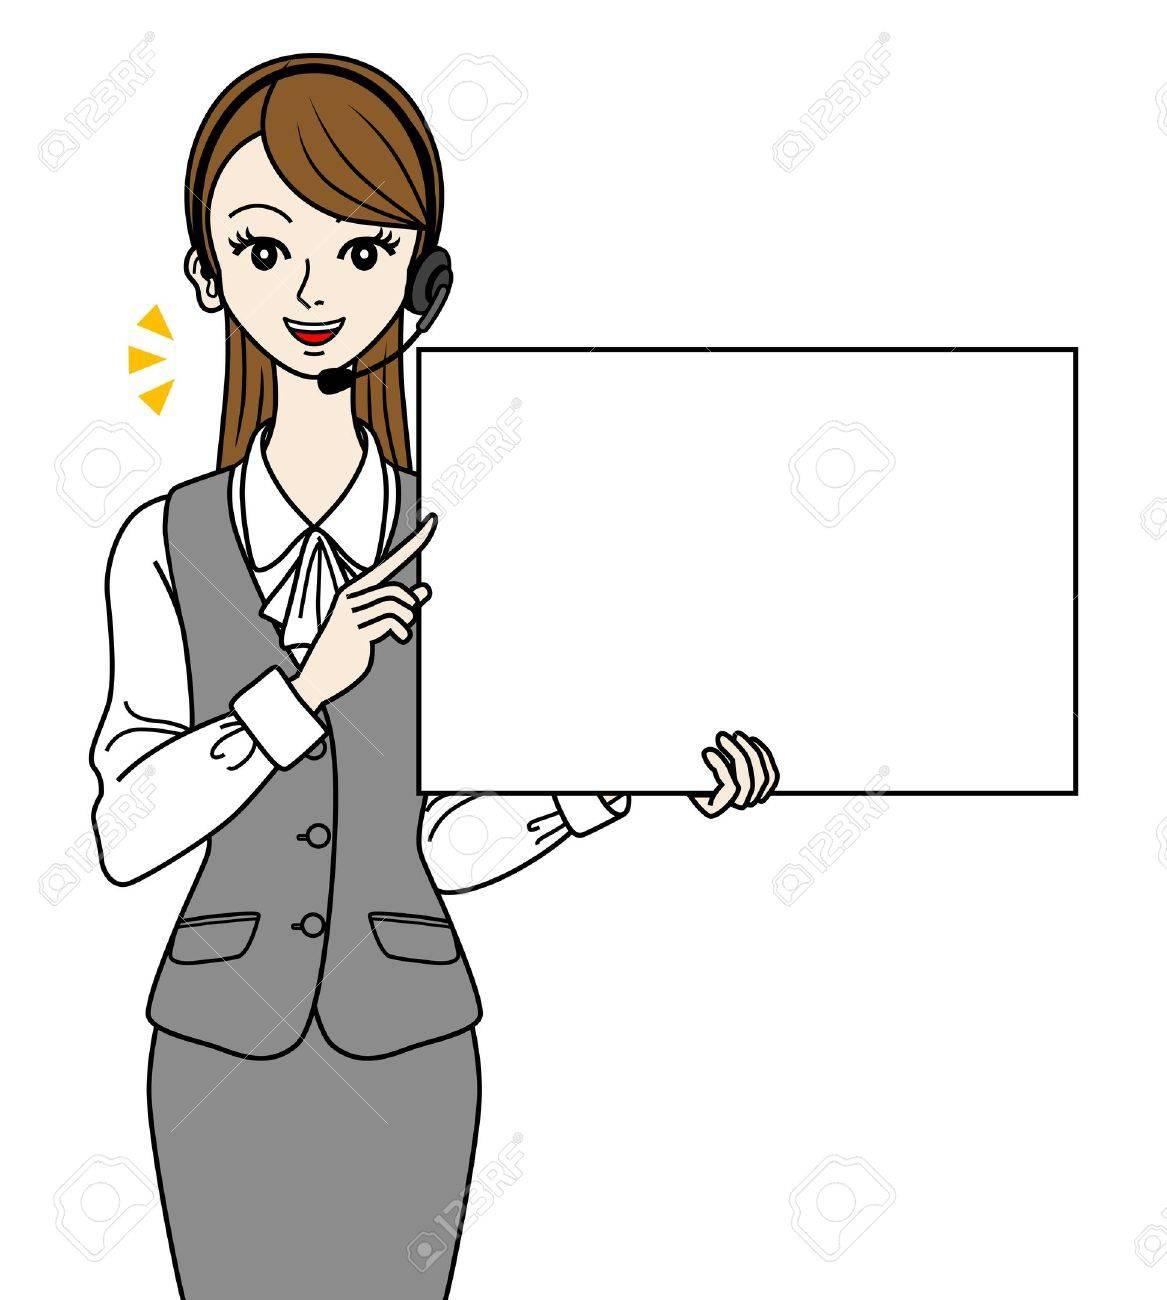 Operator with white board, -speak- Stock Vector - 16298626